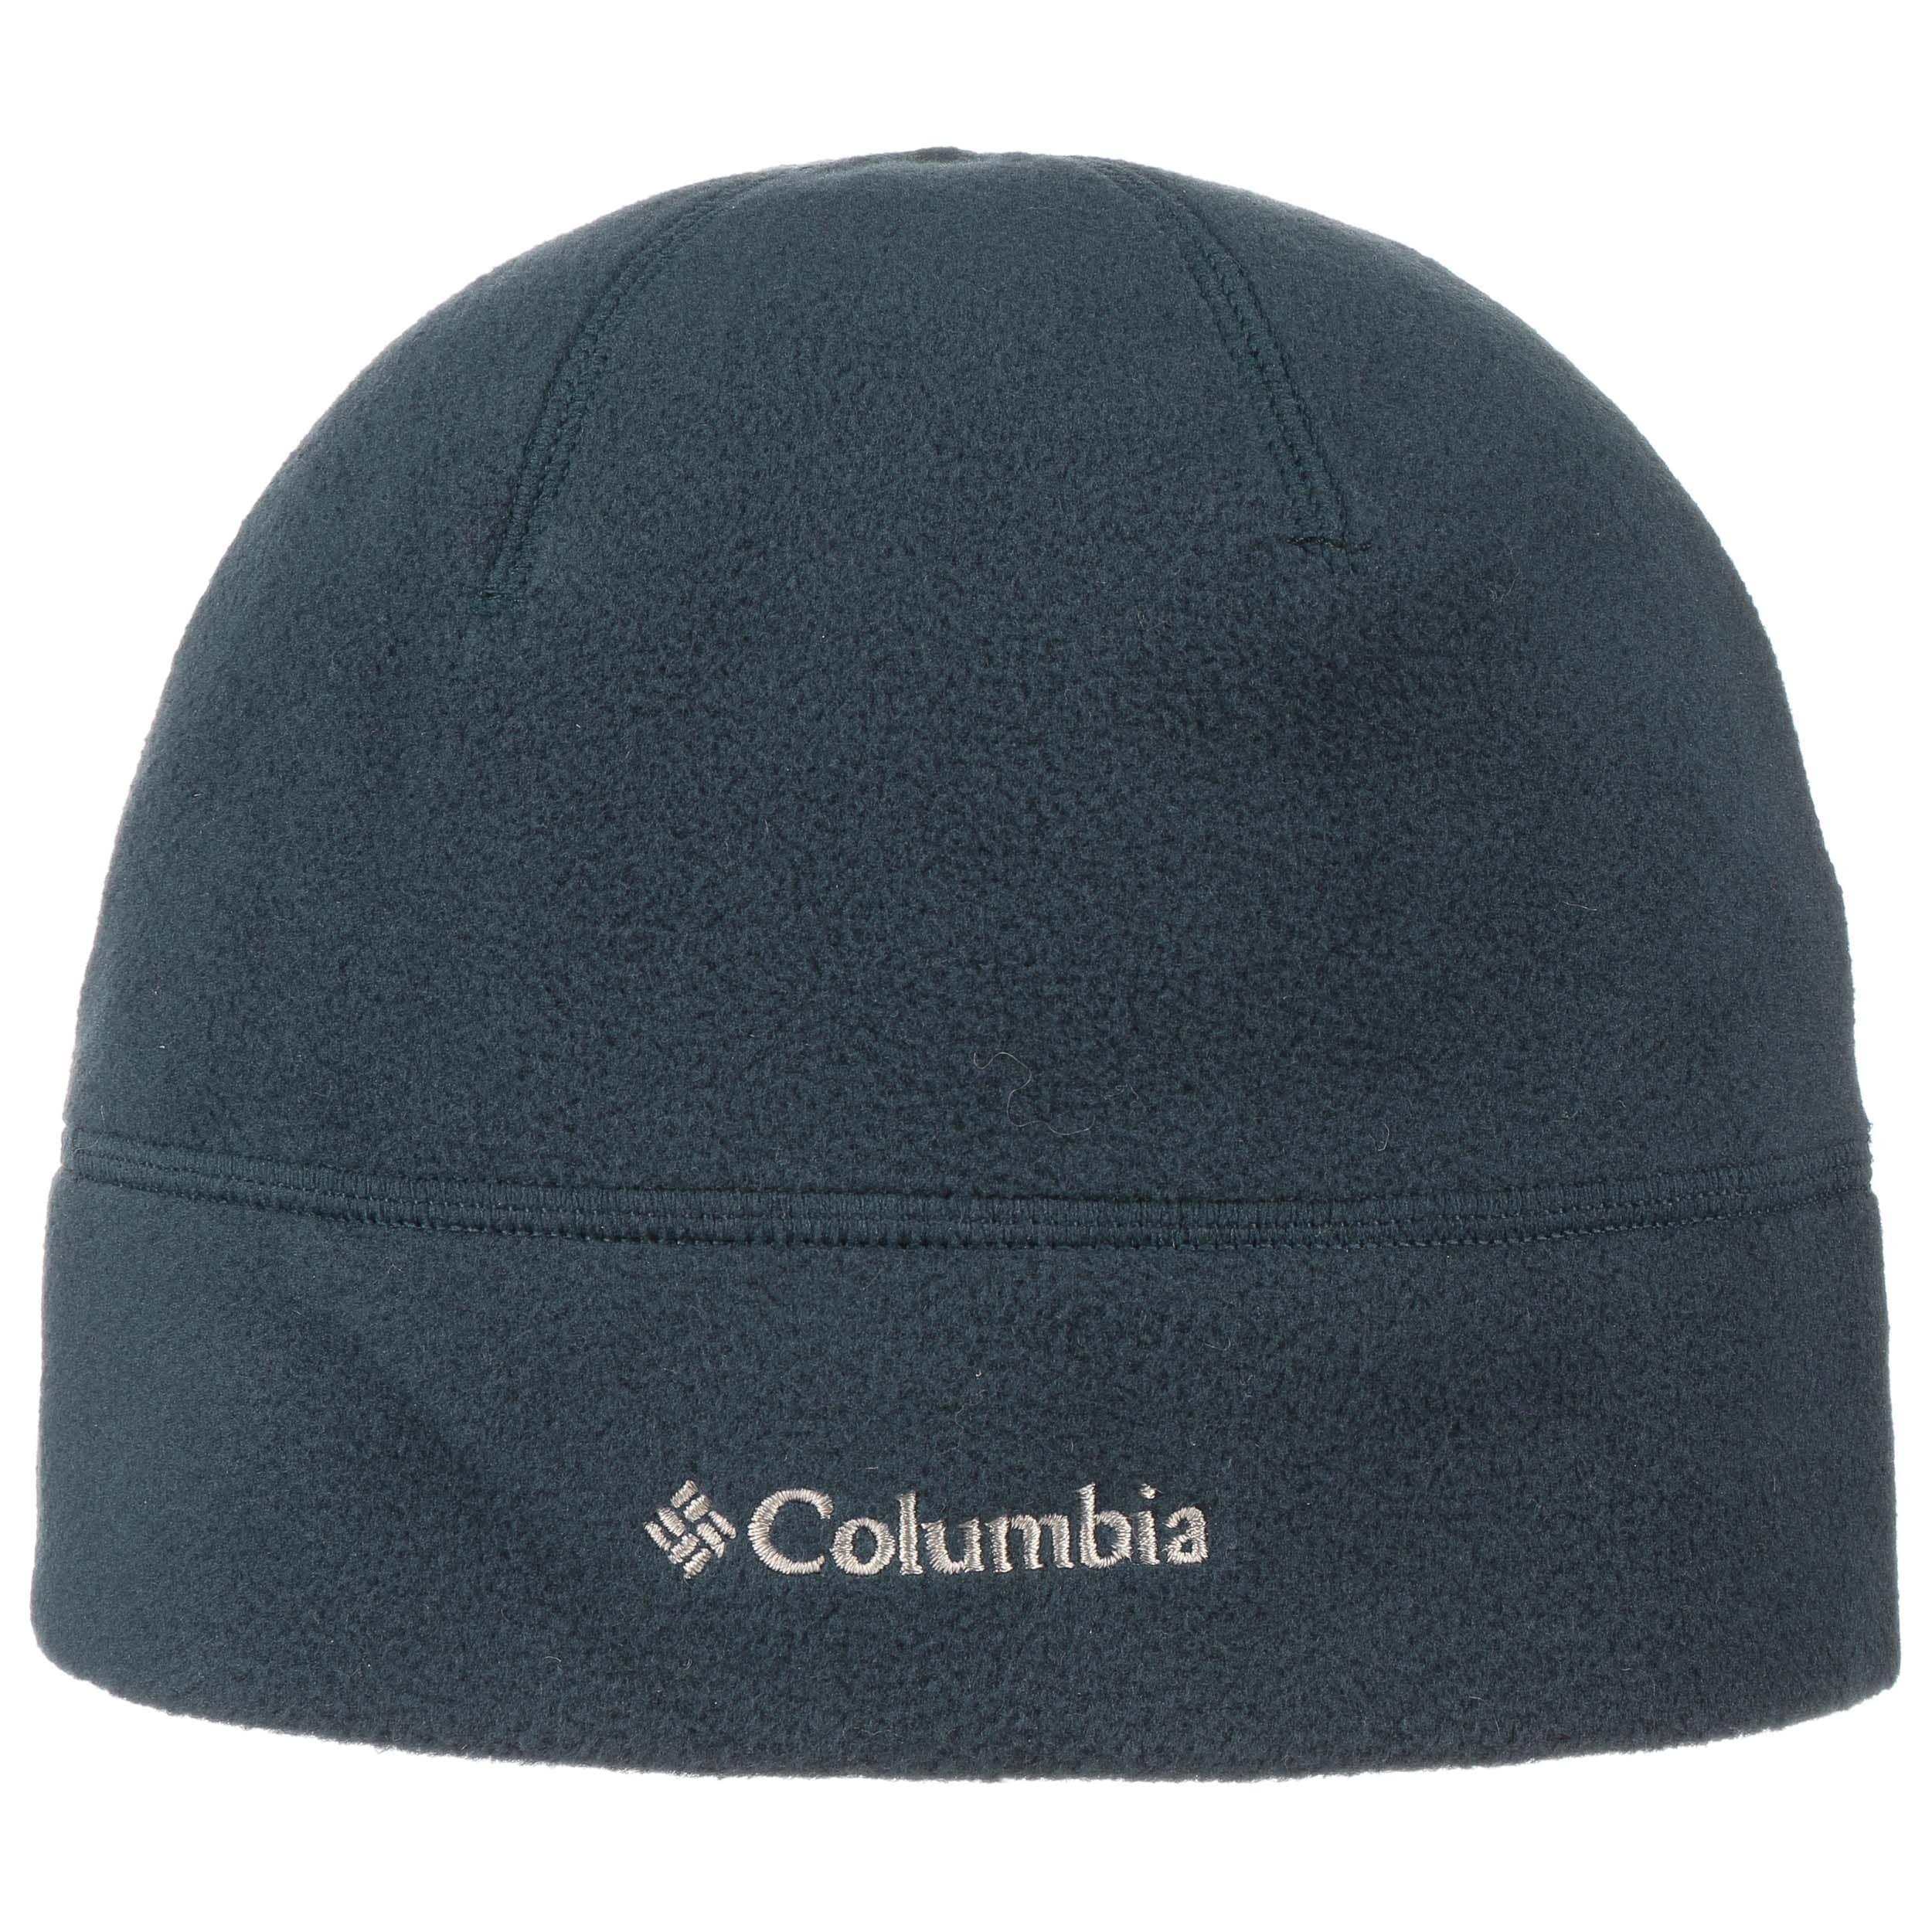 2cf4f0c6ca3 ... Thermarator Fleece Beanie by Columbia - navy 5 ...